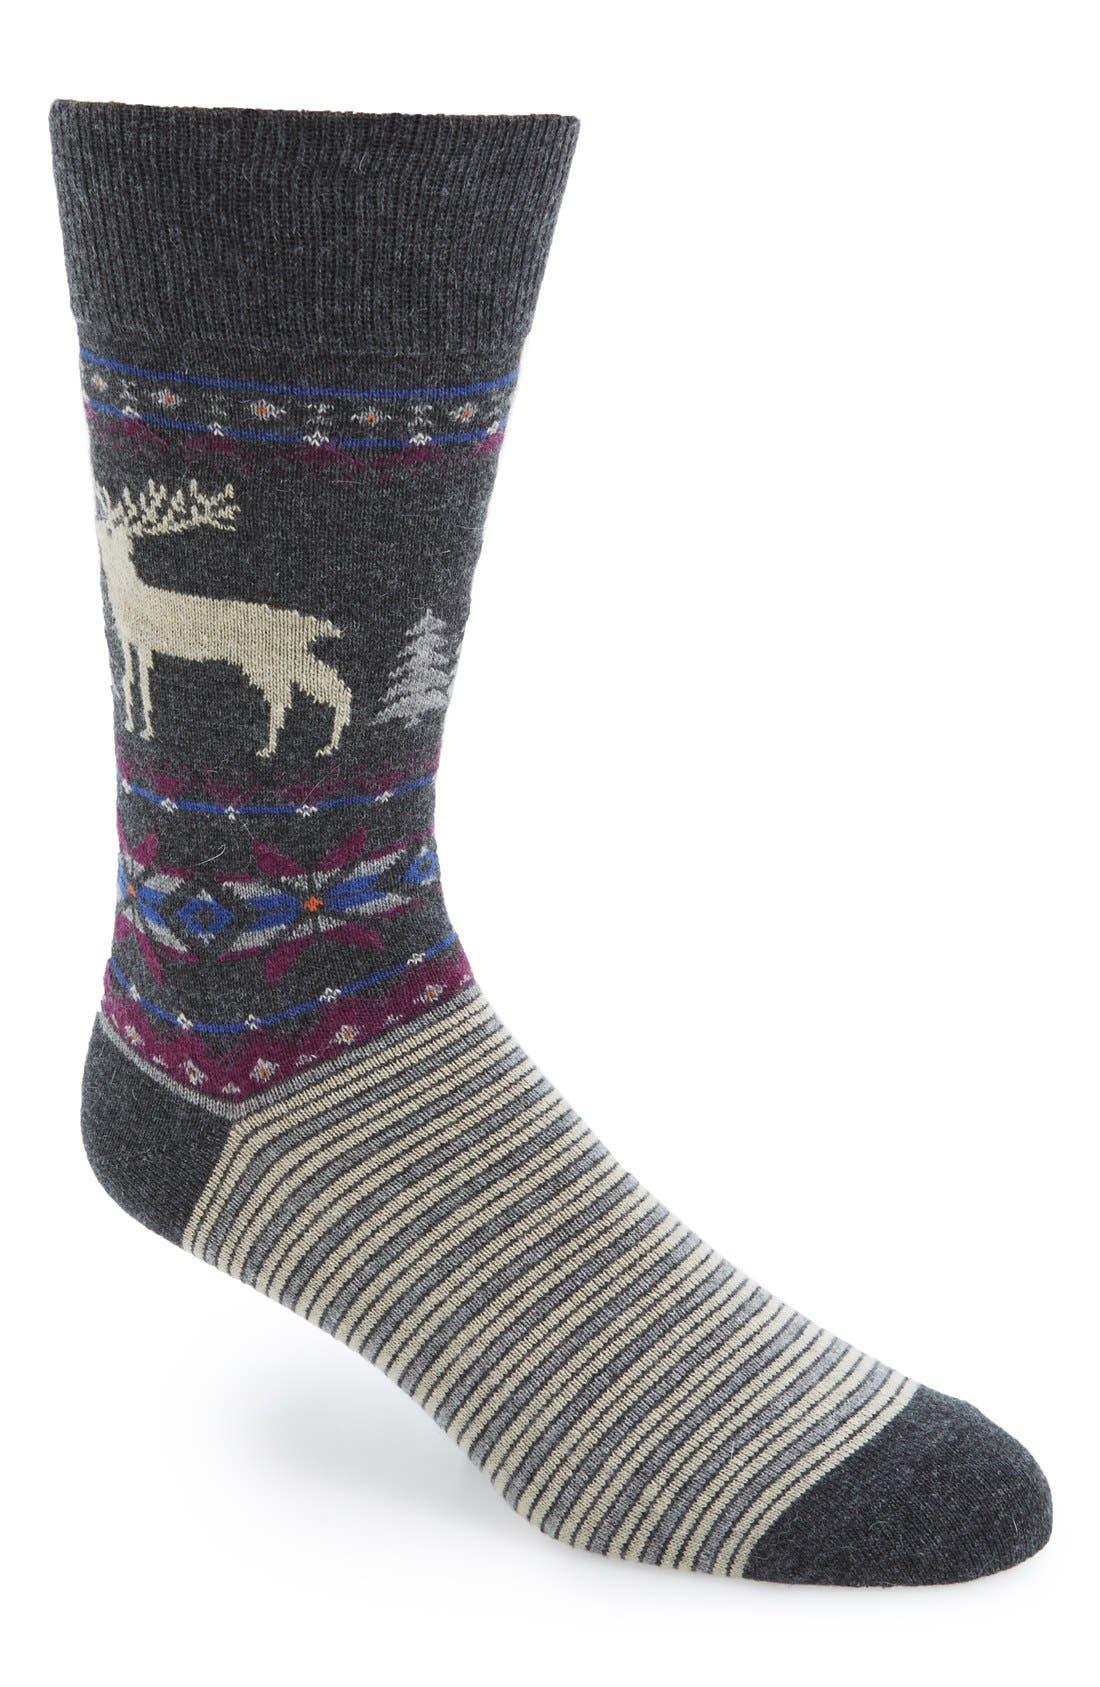 'Reindeer' Socks,                             Main thumbnail 1, color,                             010